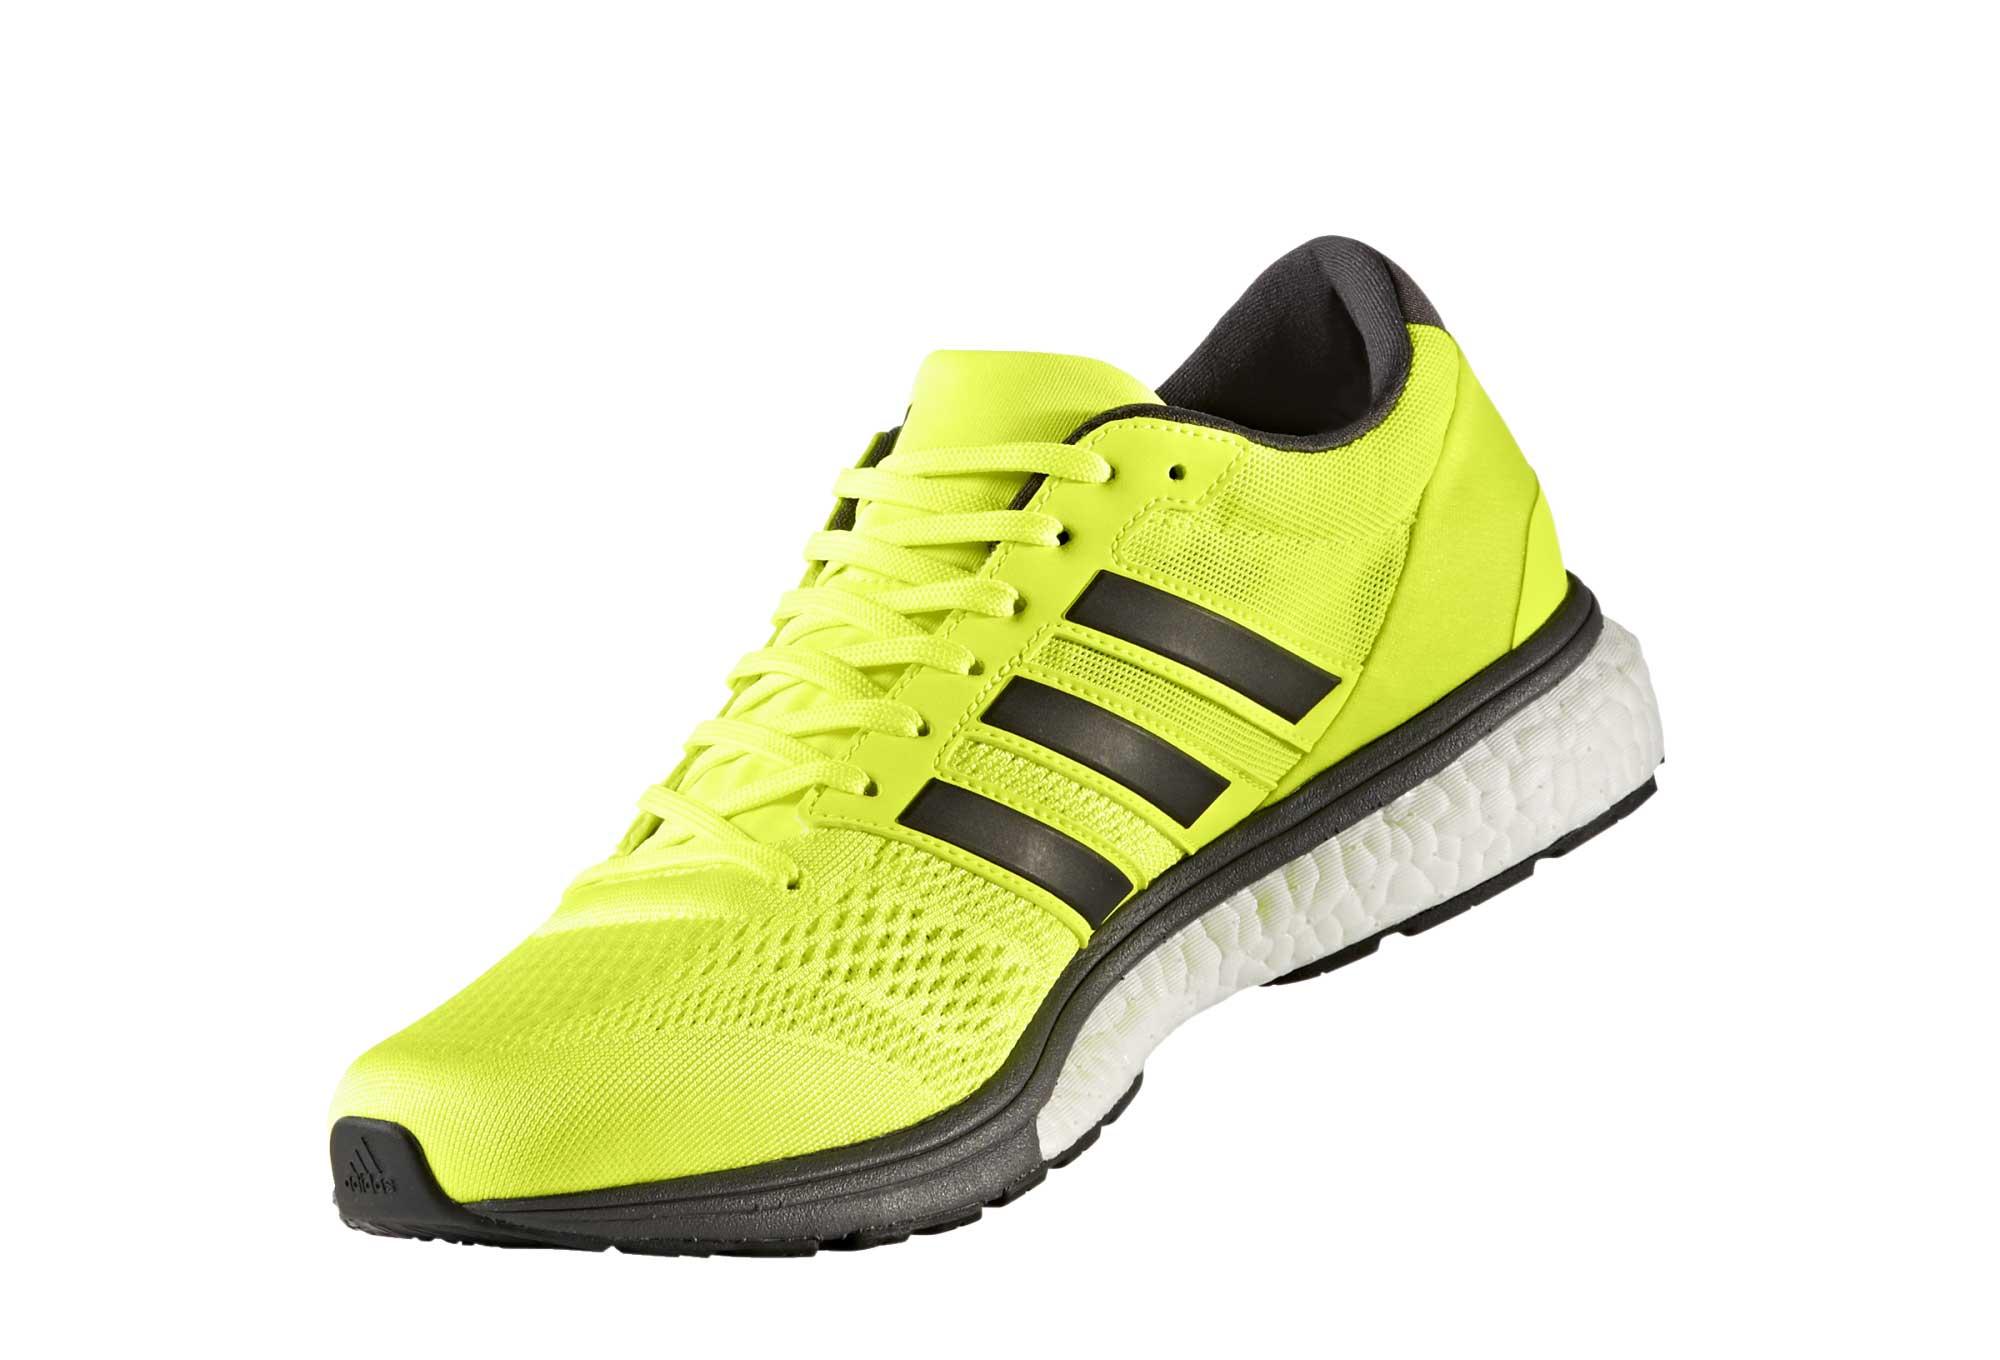 free shipping 7e236 45a93 Chaussures de Running adidas running Adizero Boston 6 Jaune  Fluo  Noir